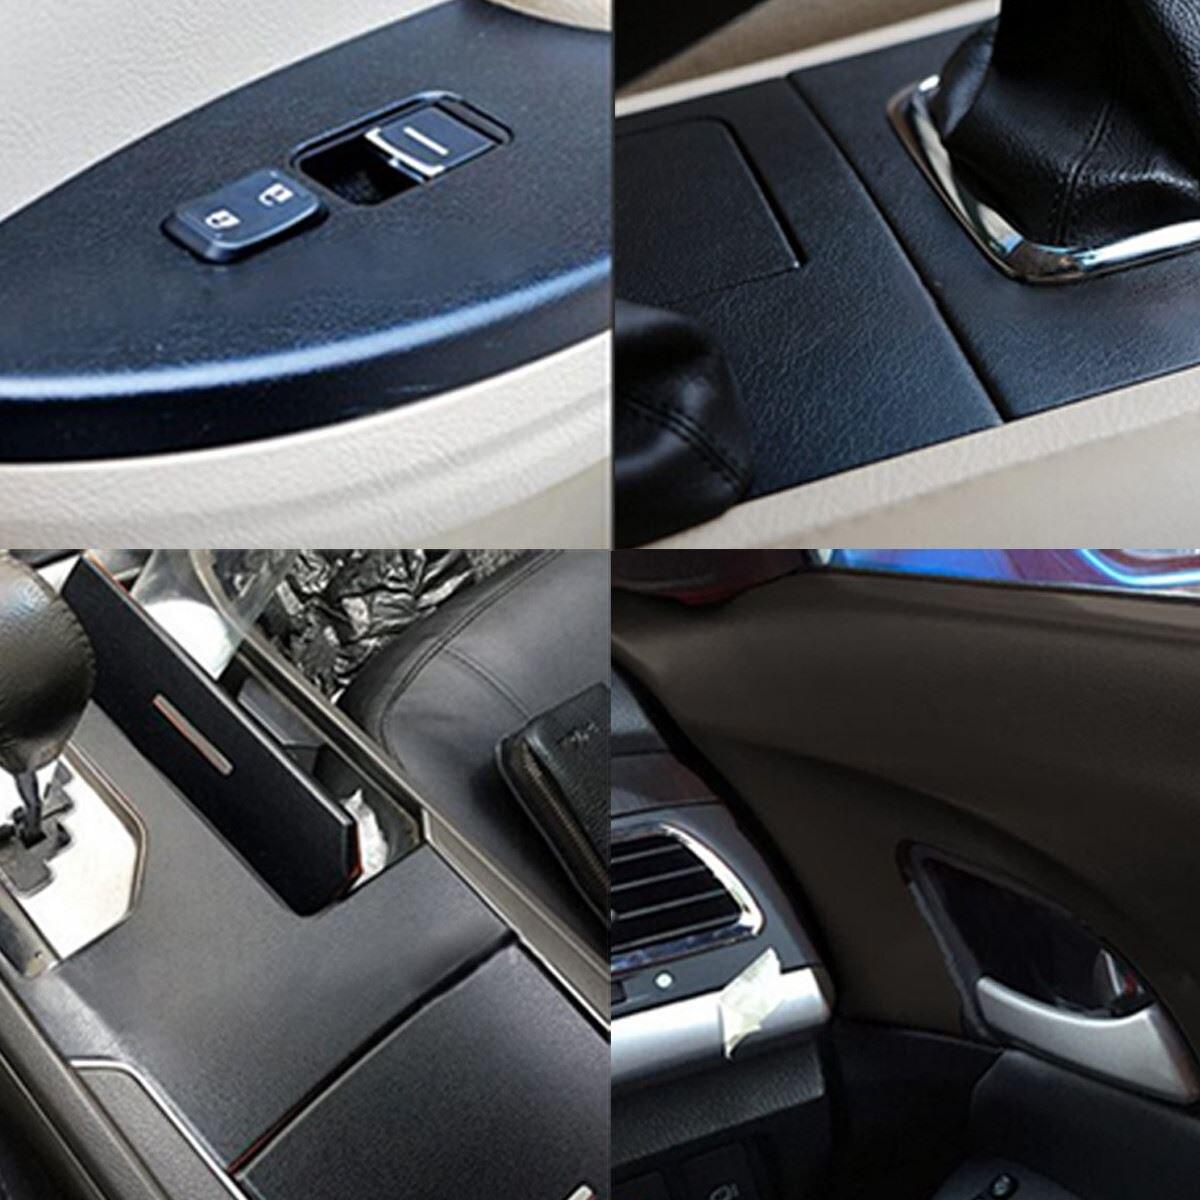 Stunning Auto Interieur Wrappen Images - Huis & Interieur Ideeën ...